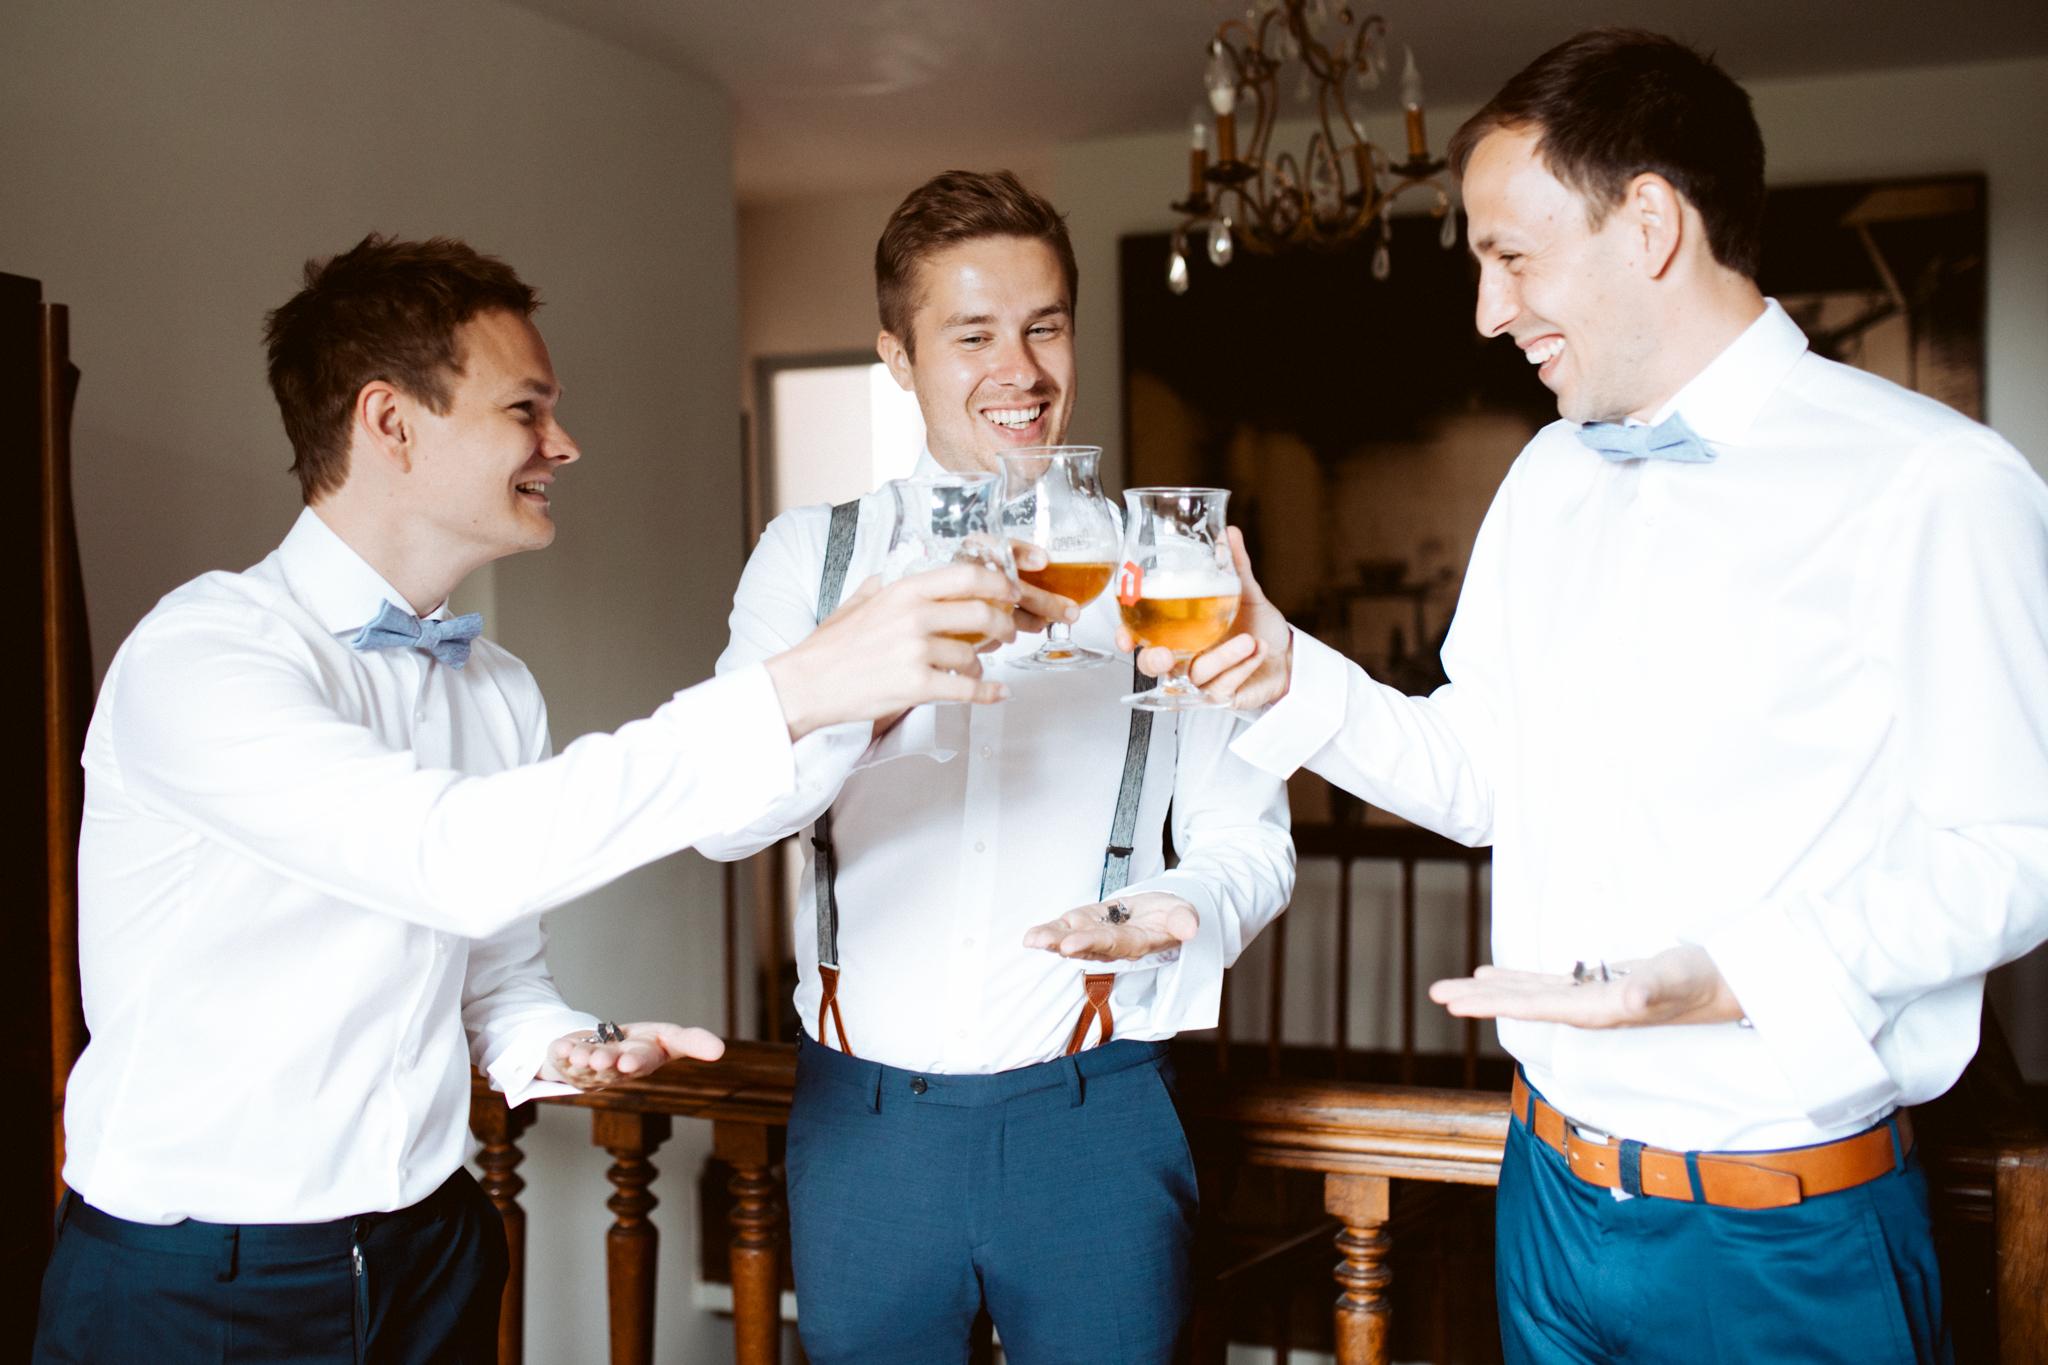 Marriage Champagne France - 019.jpg